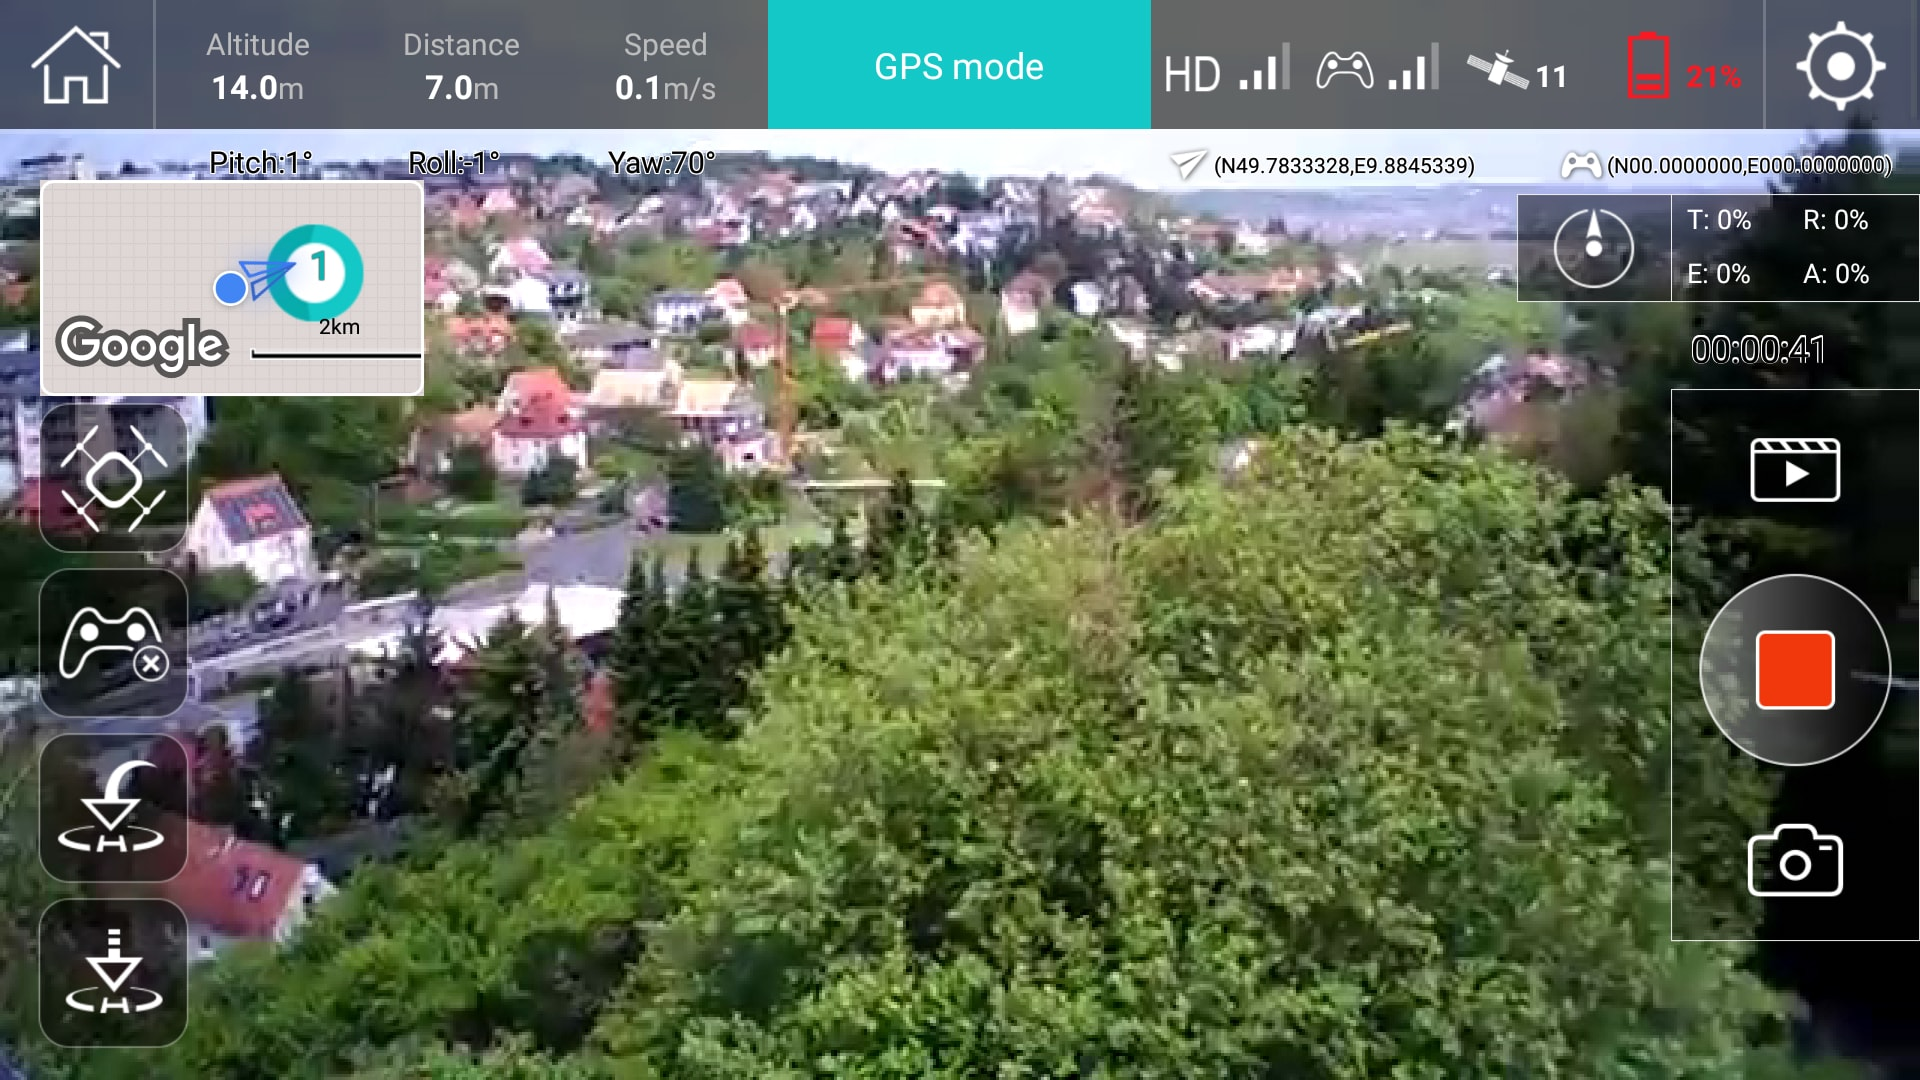 Screenshot 2017 05 25 14 01 22 684 com.csk .hbsdrone 1